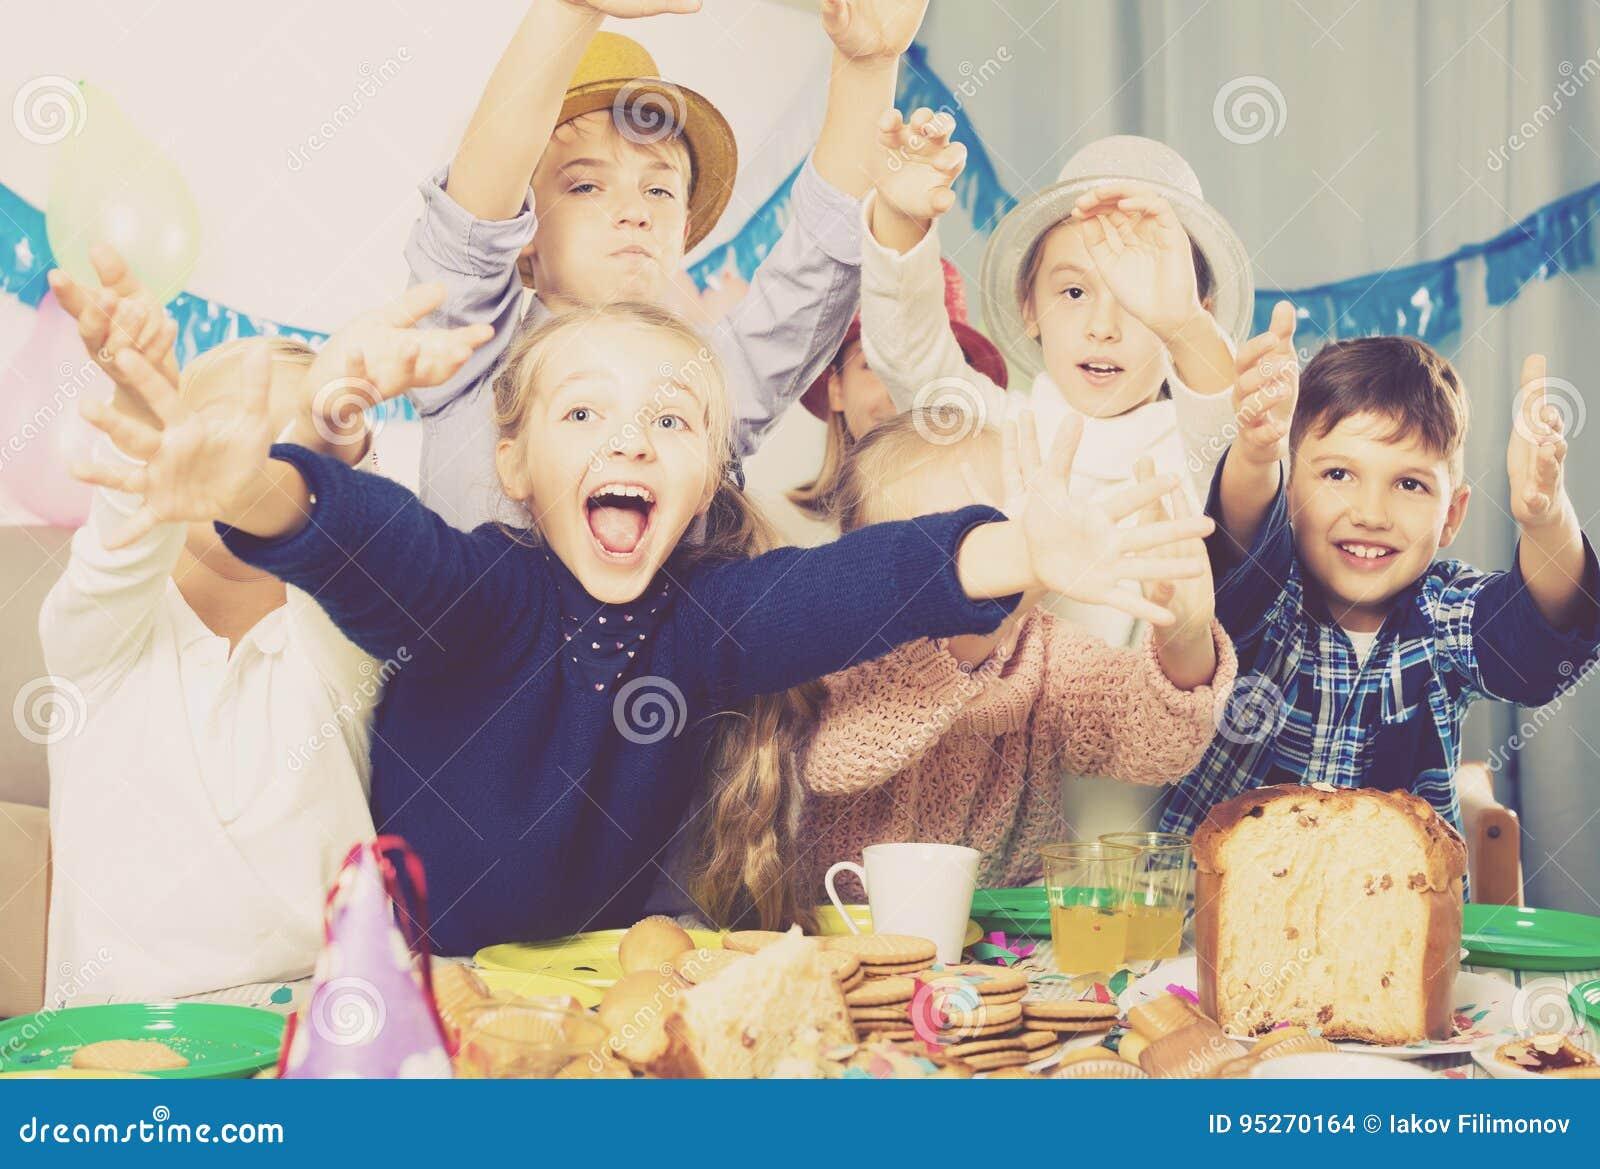 Group positive children having fun birthday party